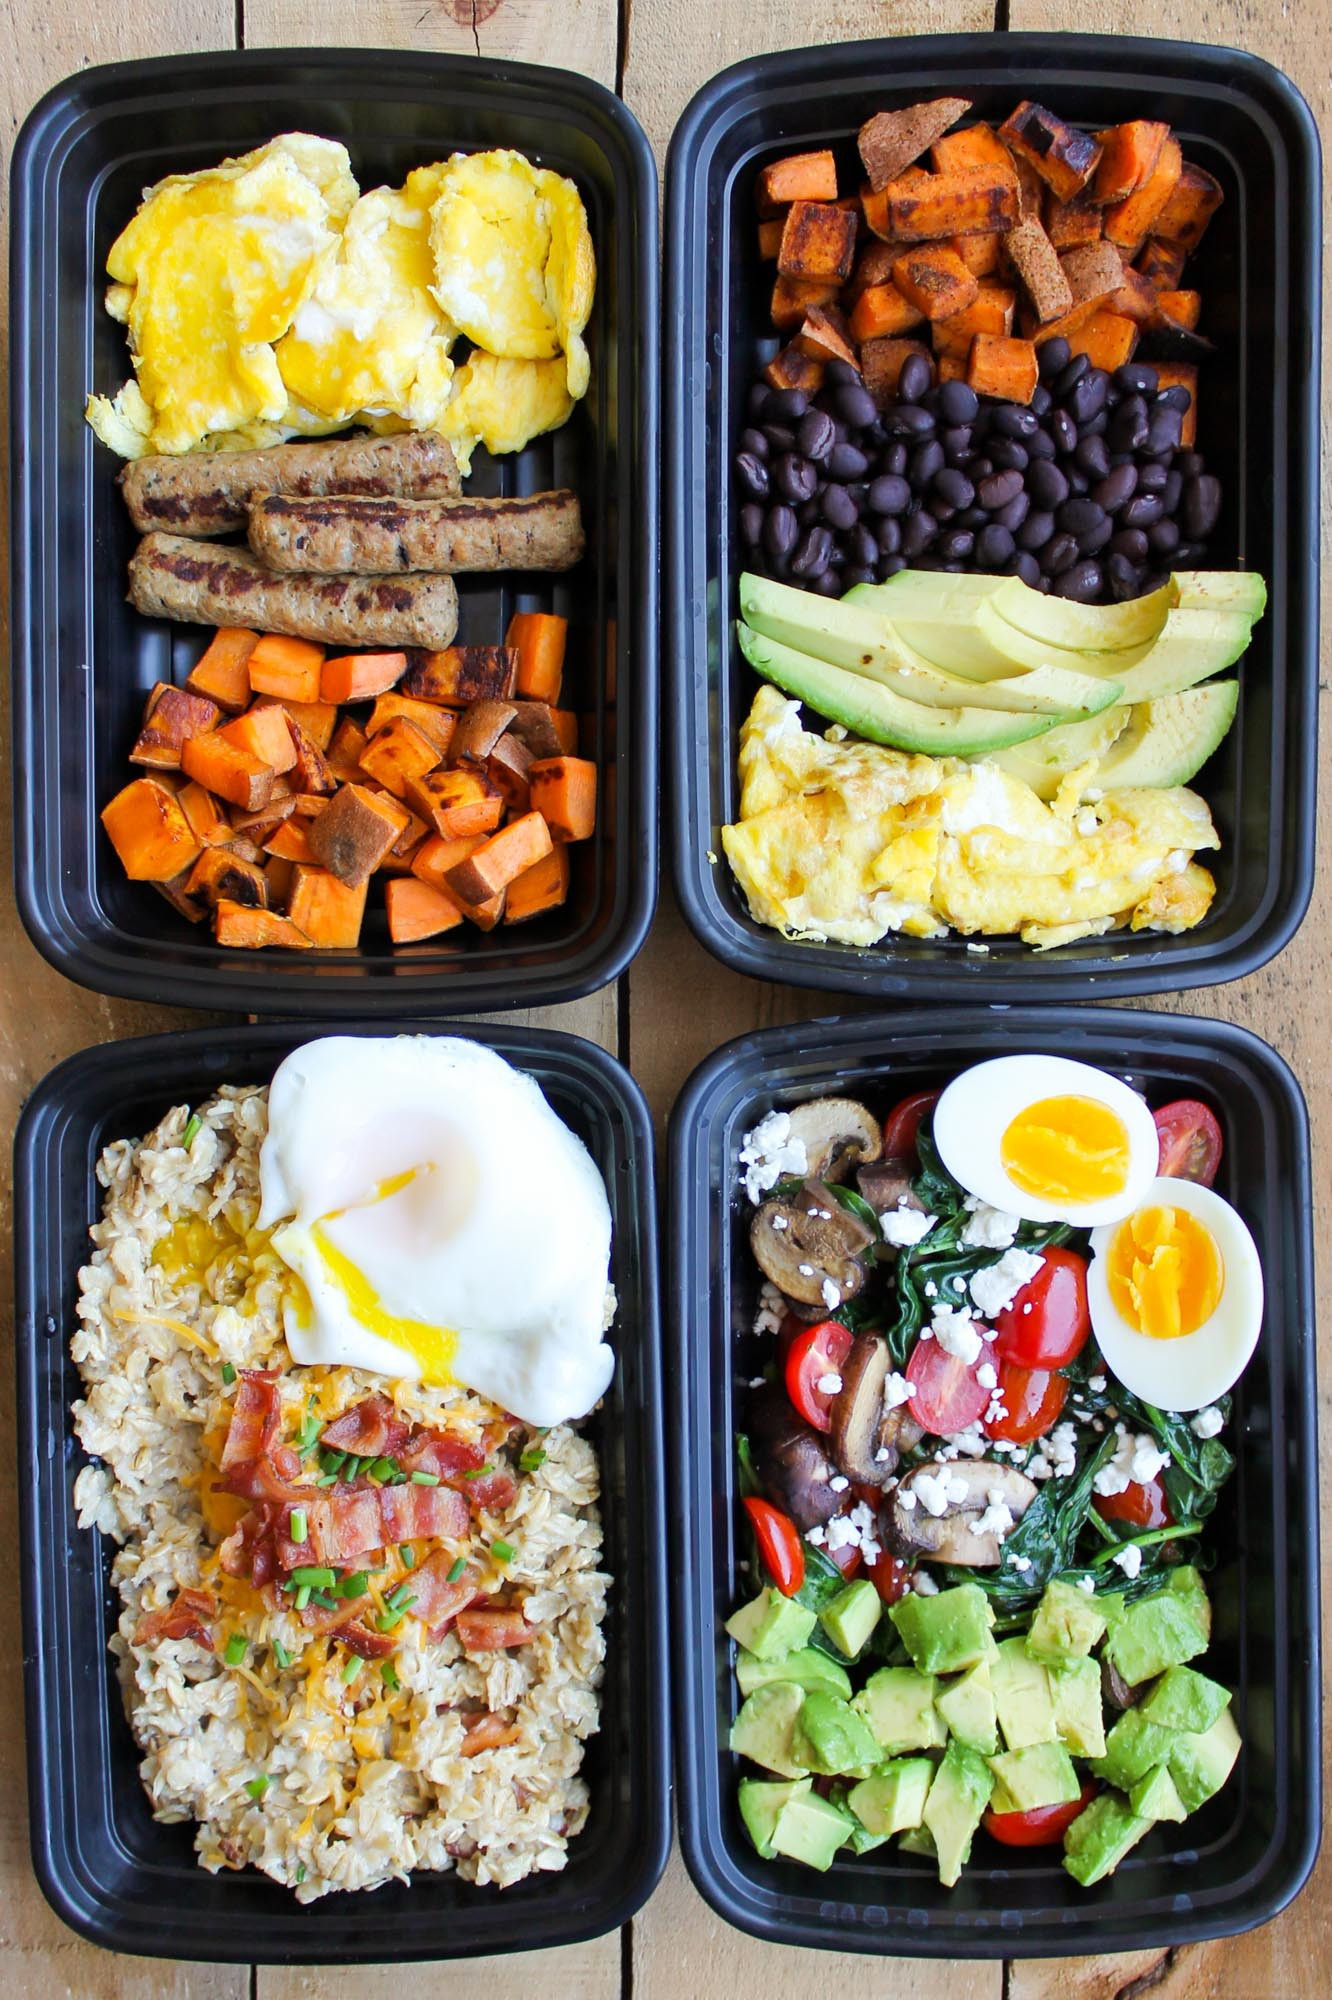 Healthy Breakfast Prep  Make Ahead Breakfast Meal Prep Bowls 4 Ways Smile Sandwich